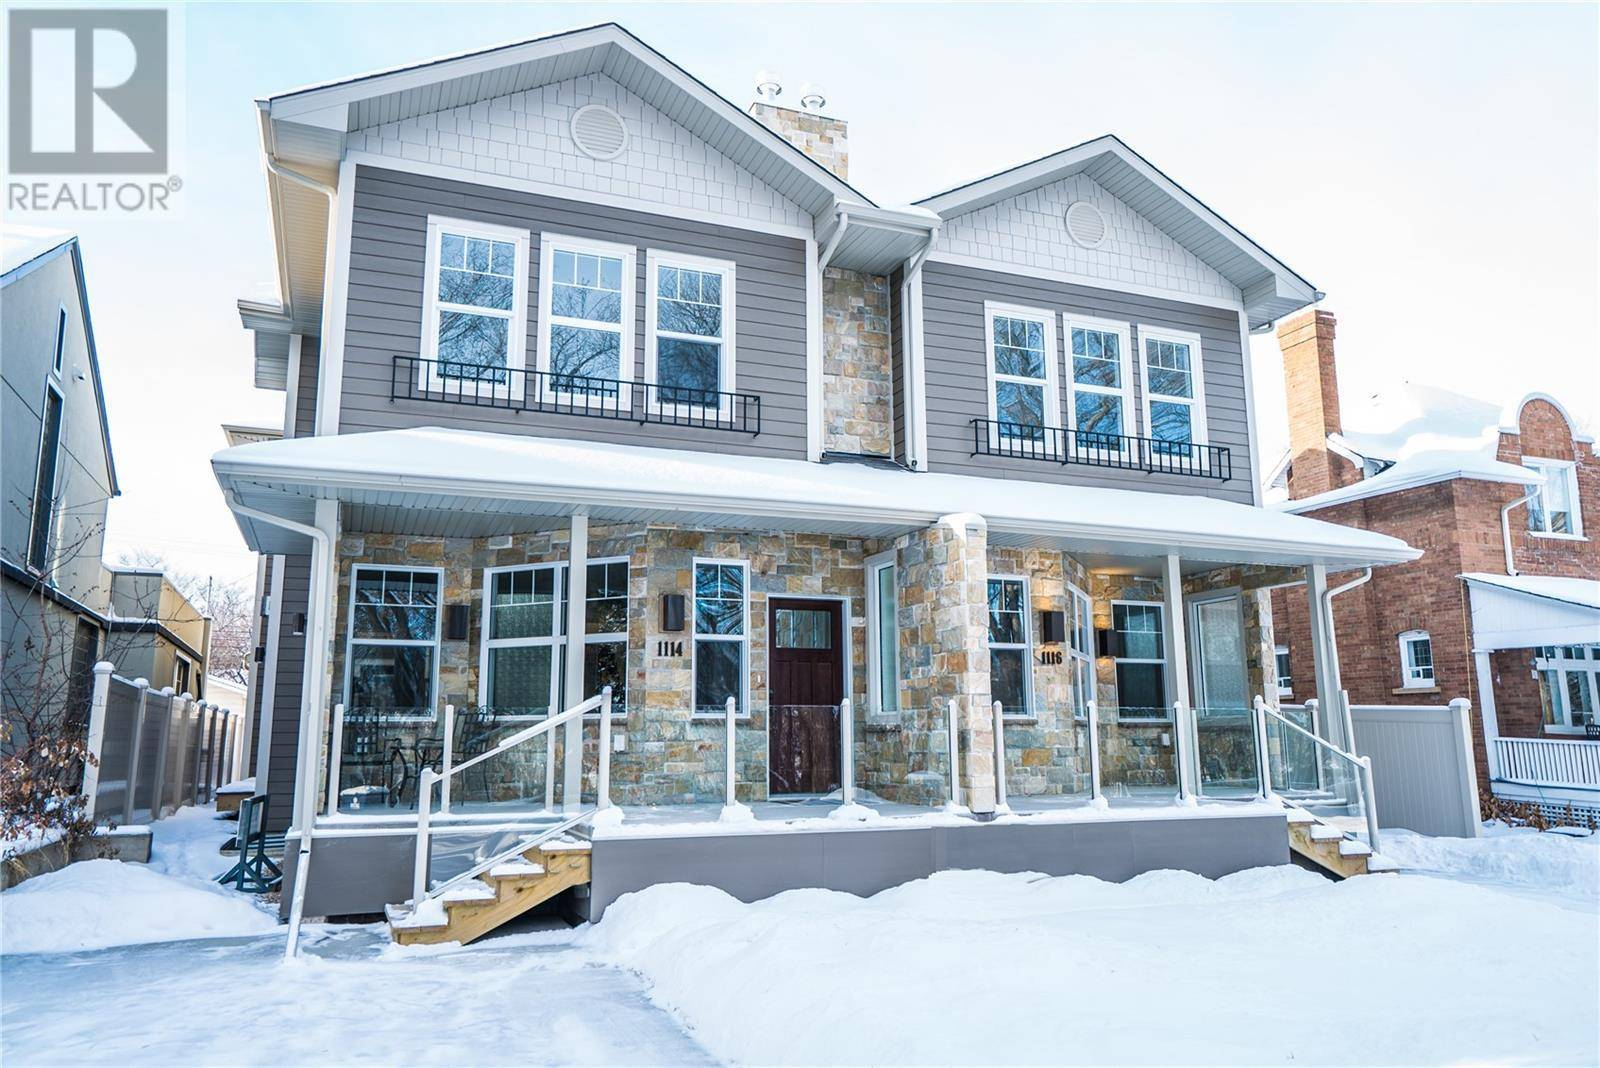 House for sale at 1114 Spadina Cres E Saskatoon Saskatchewan - MLS: SK790134